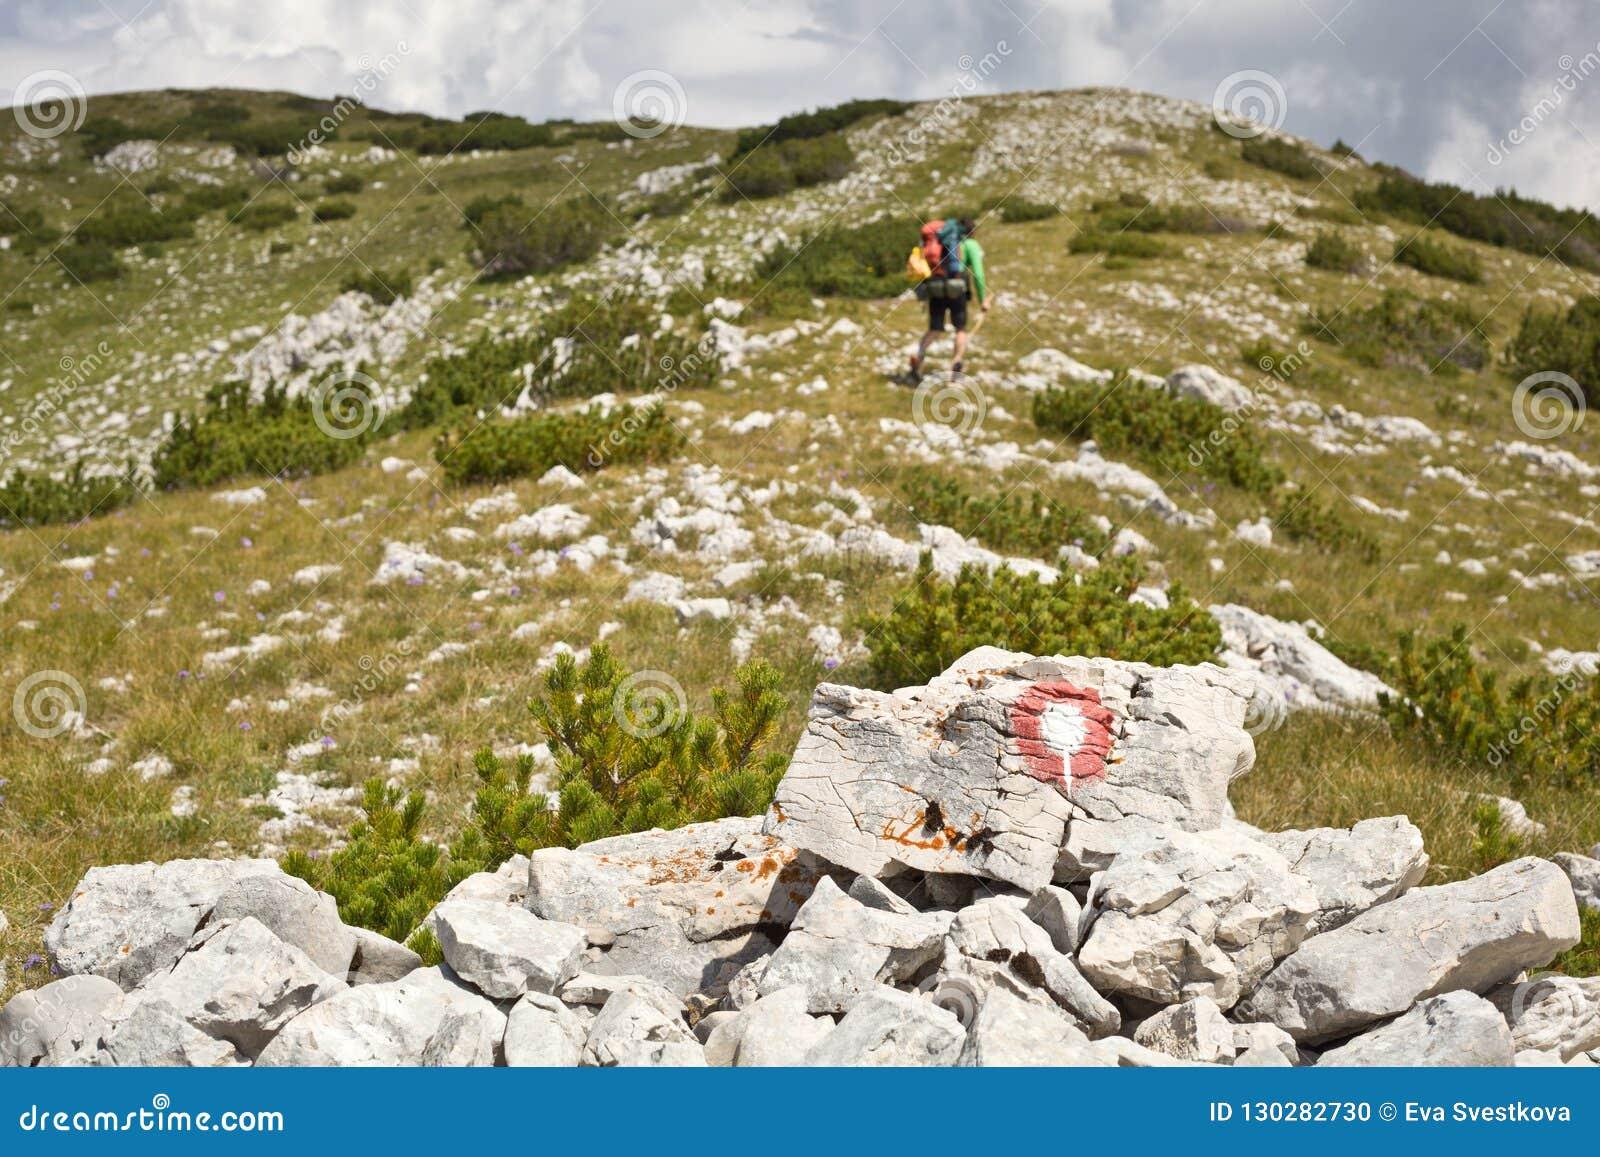 Hiking in Vran mountains - Bosnia and Herzegovina